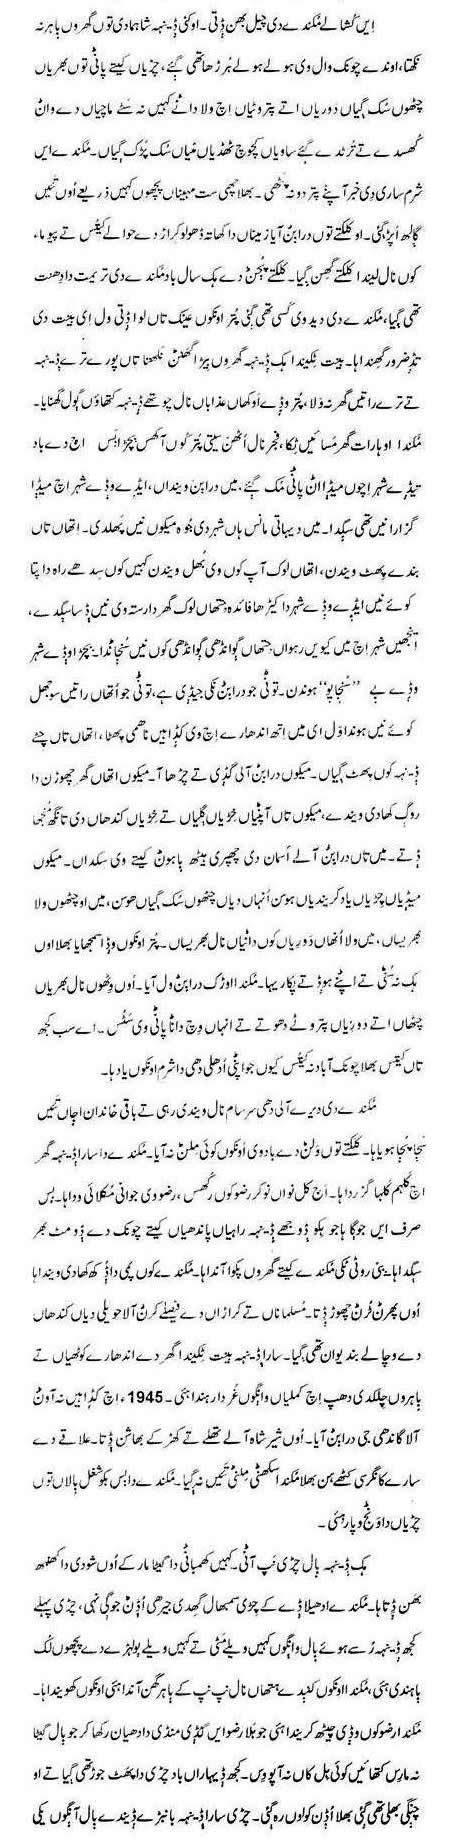 Seraiki Afsana Jatti Chiri (Habib Mohana) Part-2